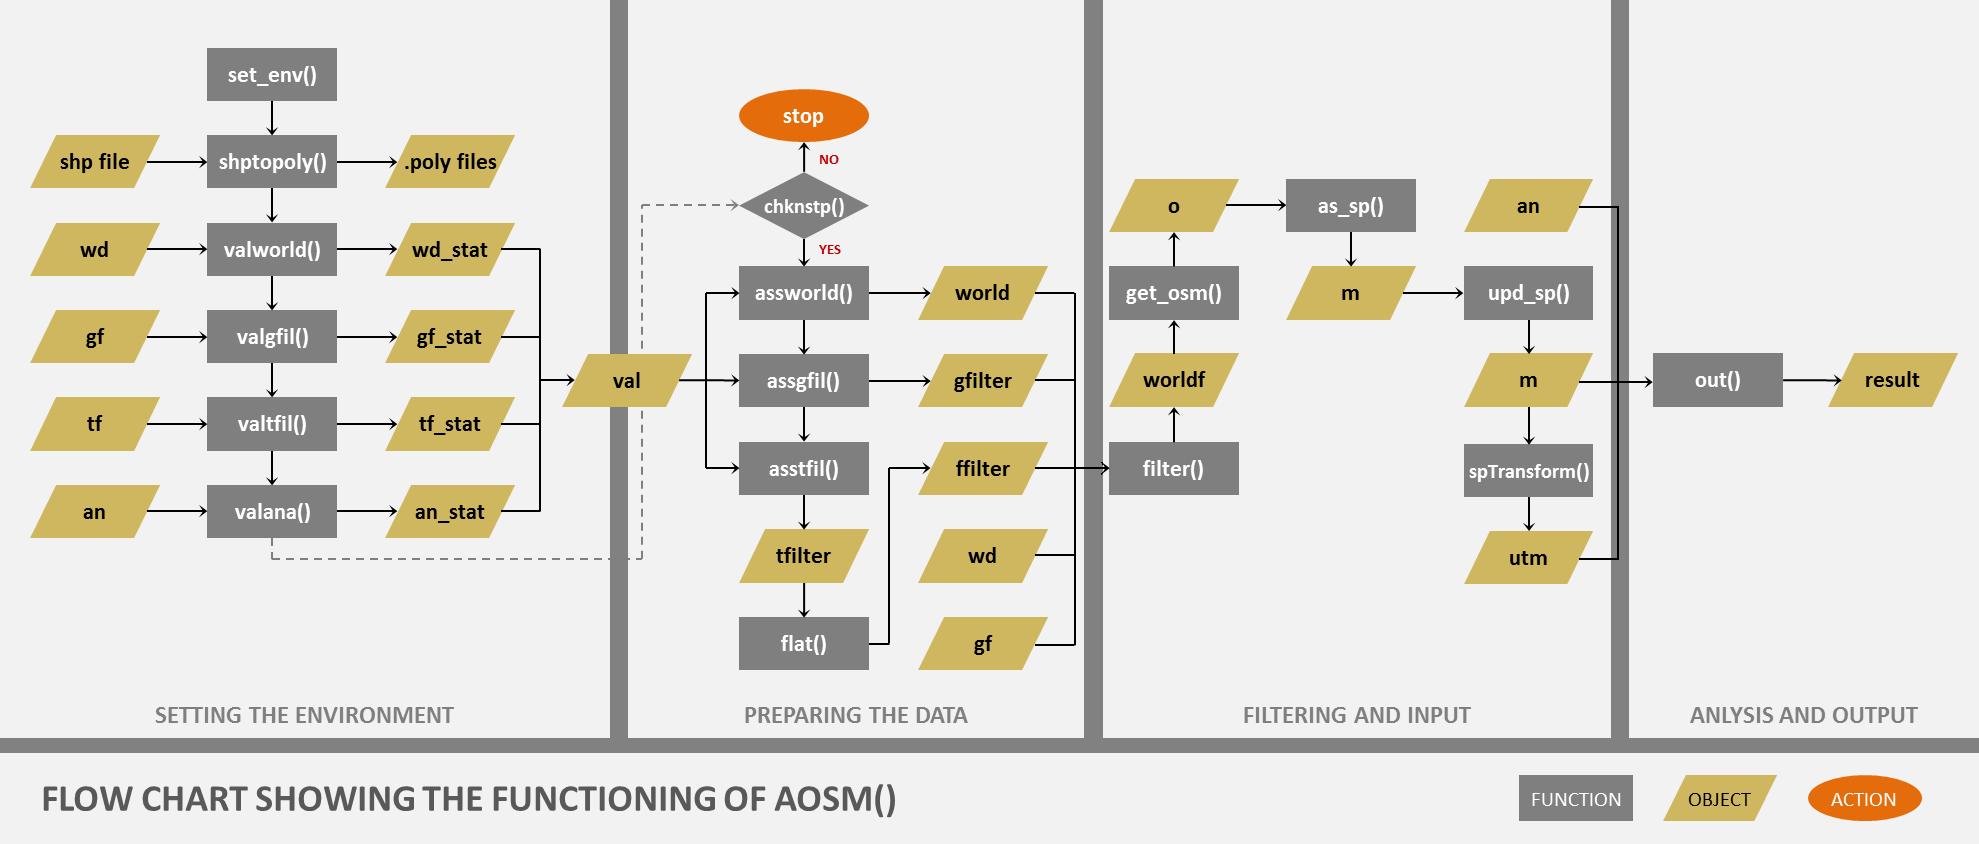 Complete Flow Diagram of the script